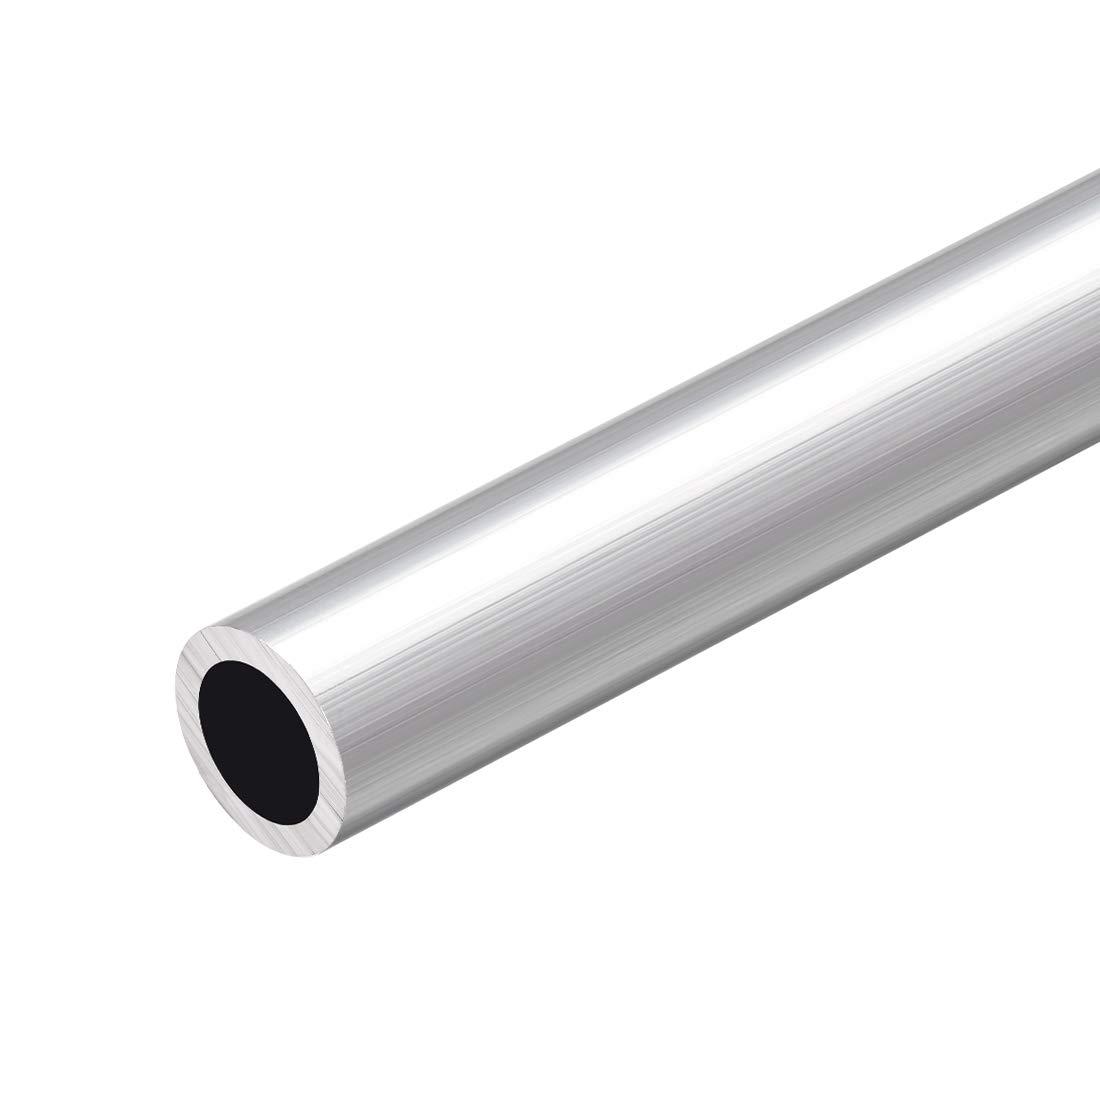 uxcell 6063 Aluminum Round Tube 300mm Length 20mm OD 14mm Inner Dia Seamless Aluminum Straight Tubing 2 Pcs